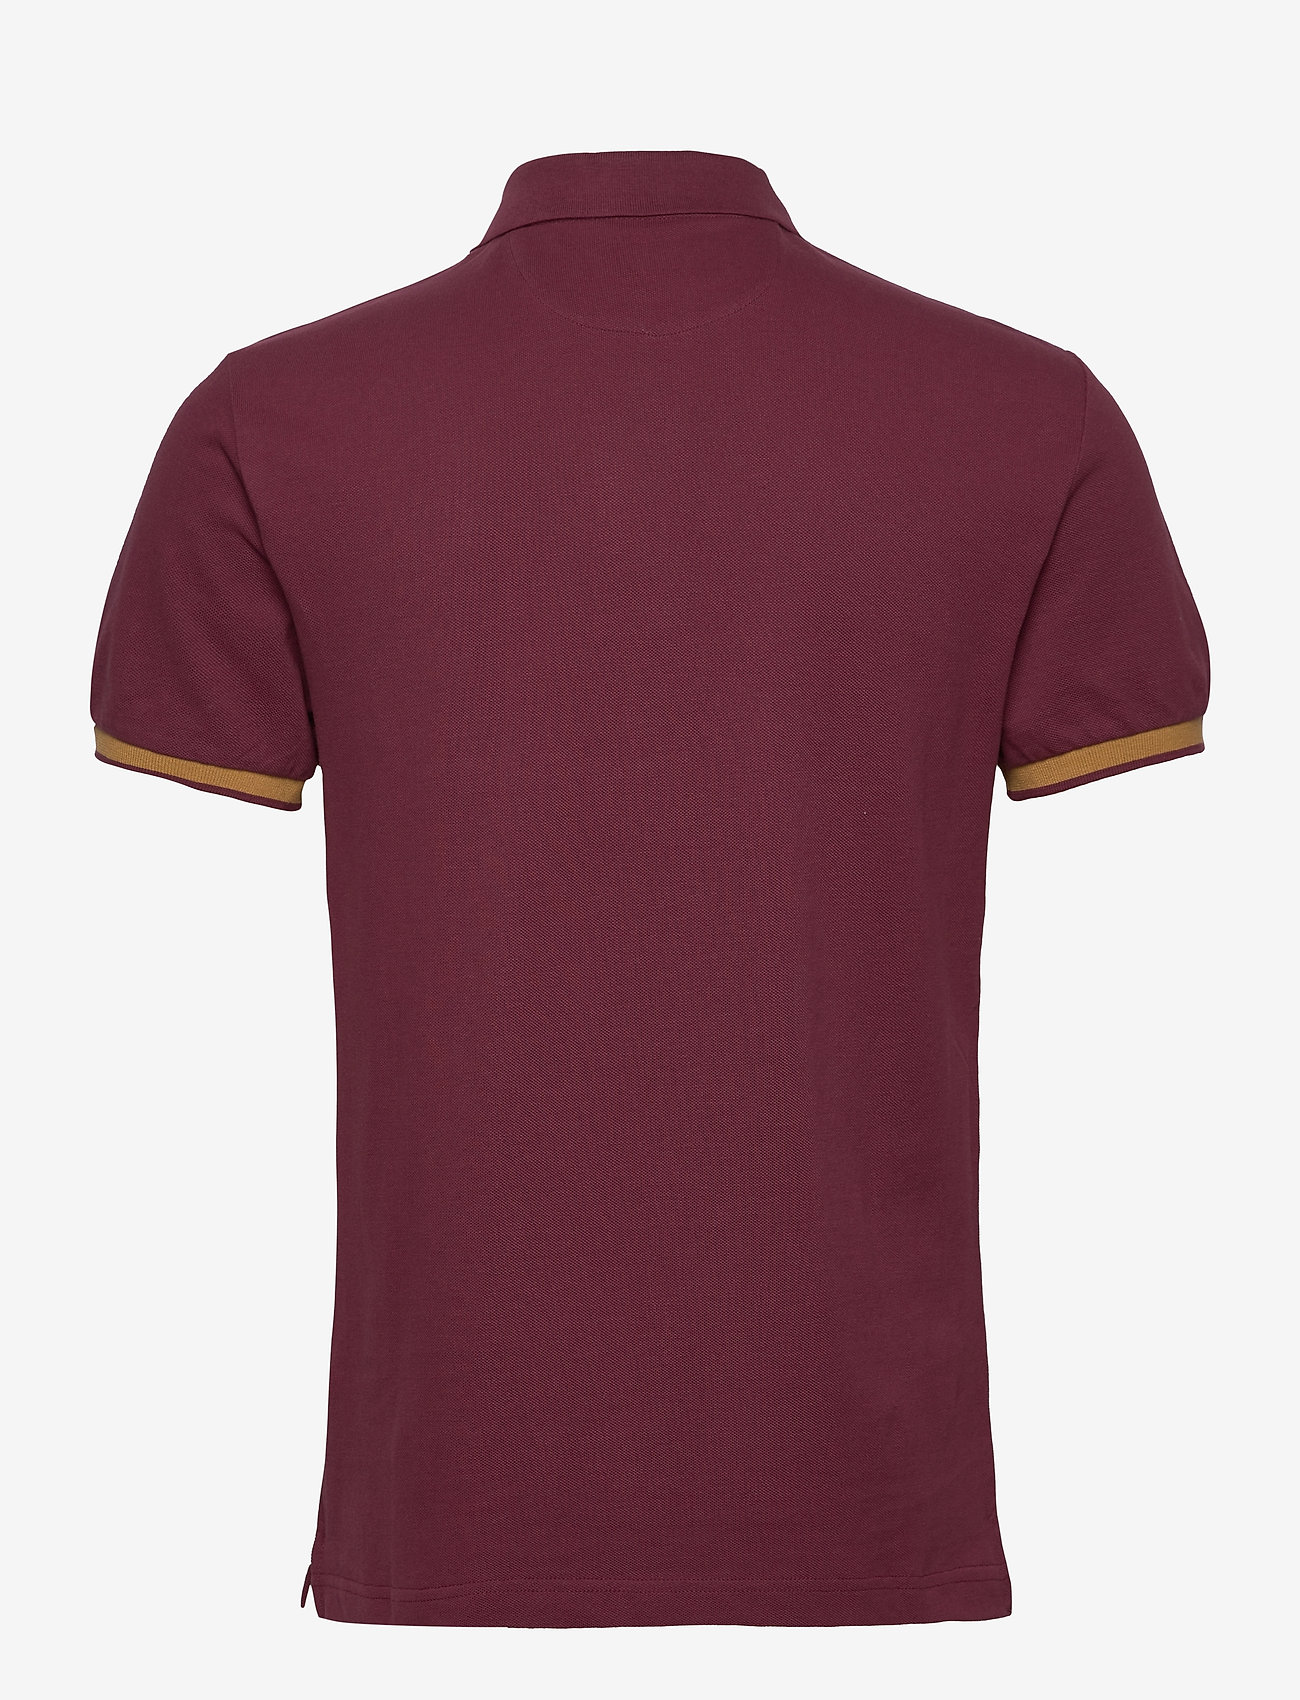 Hackett London BLACKWATCH CREST - Poloskjorter OXBLOOD - Menn Klær